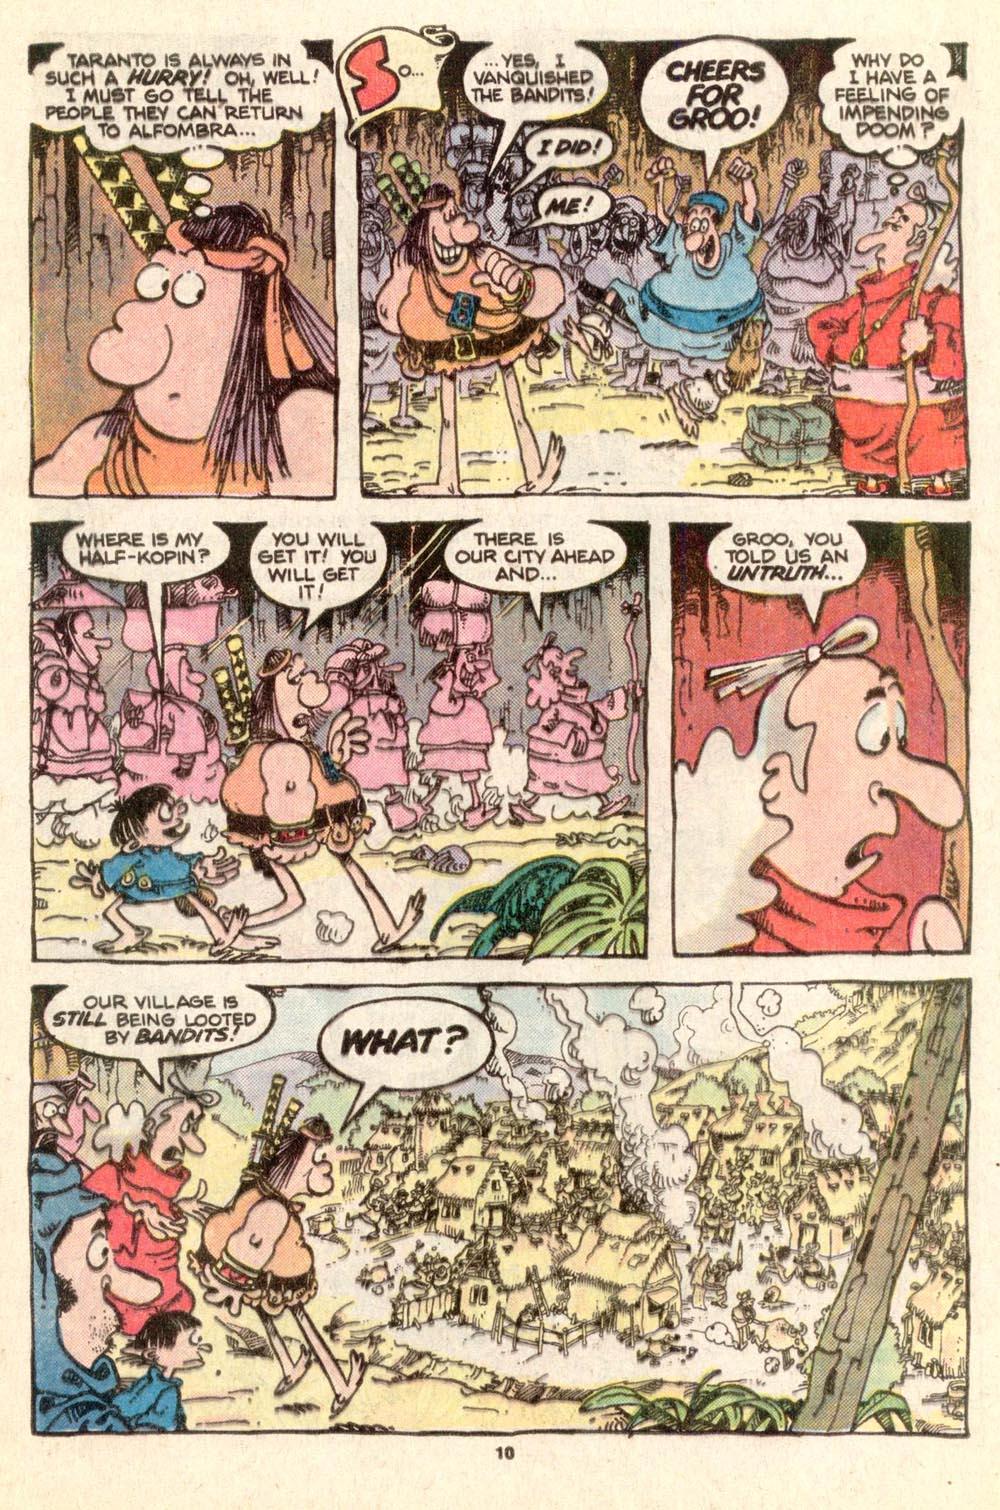 Read online Sergio Aragonés Groo the Wanderer comic -  Issue #25 - 10